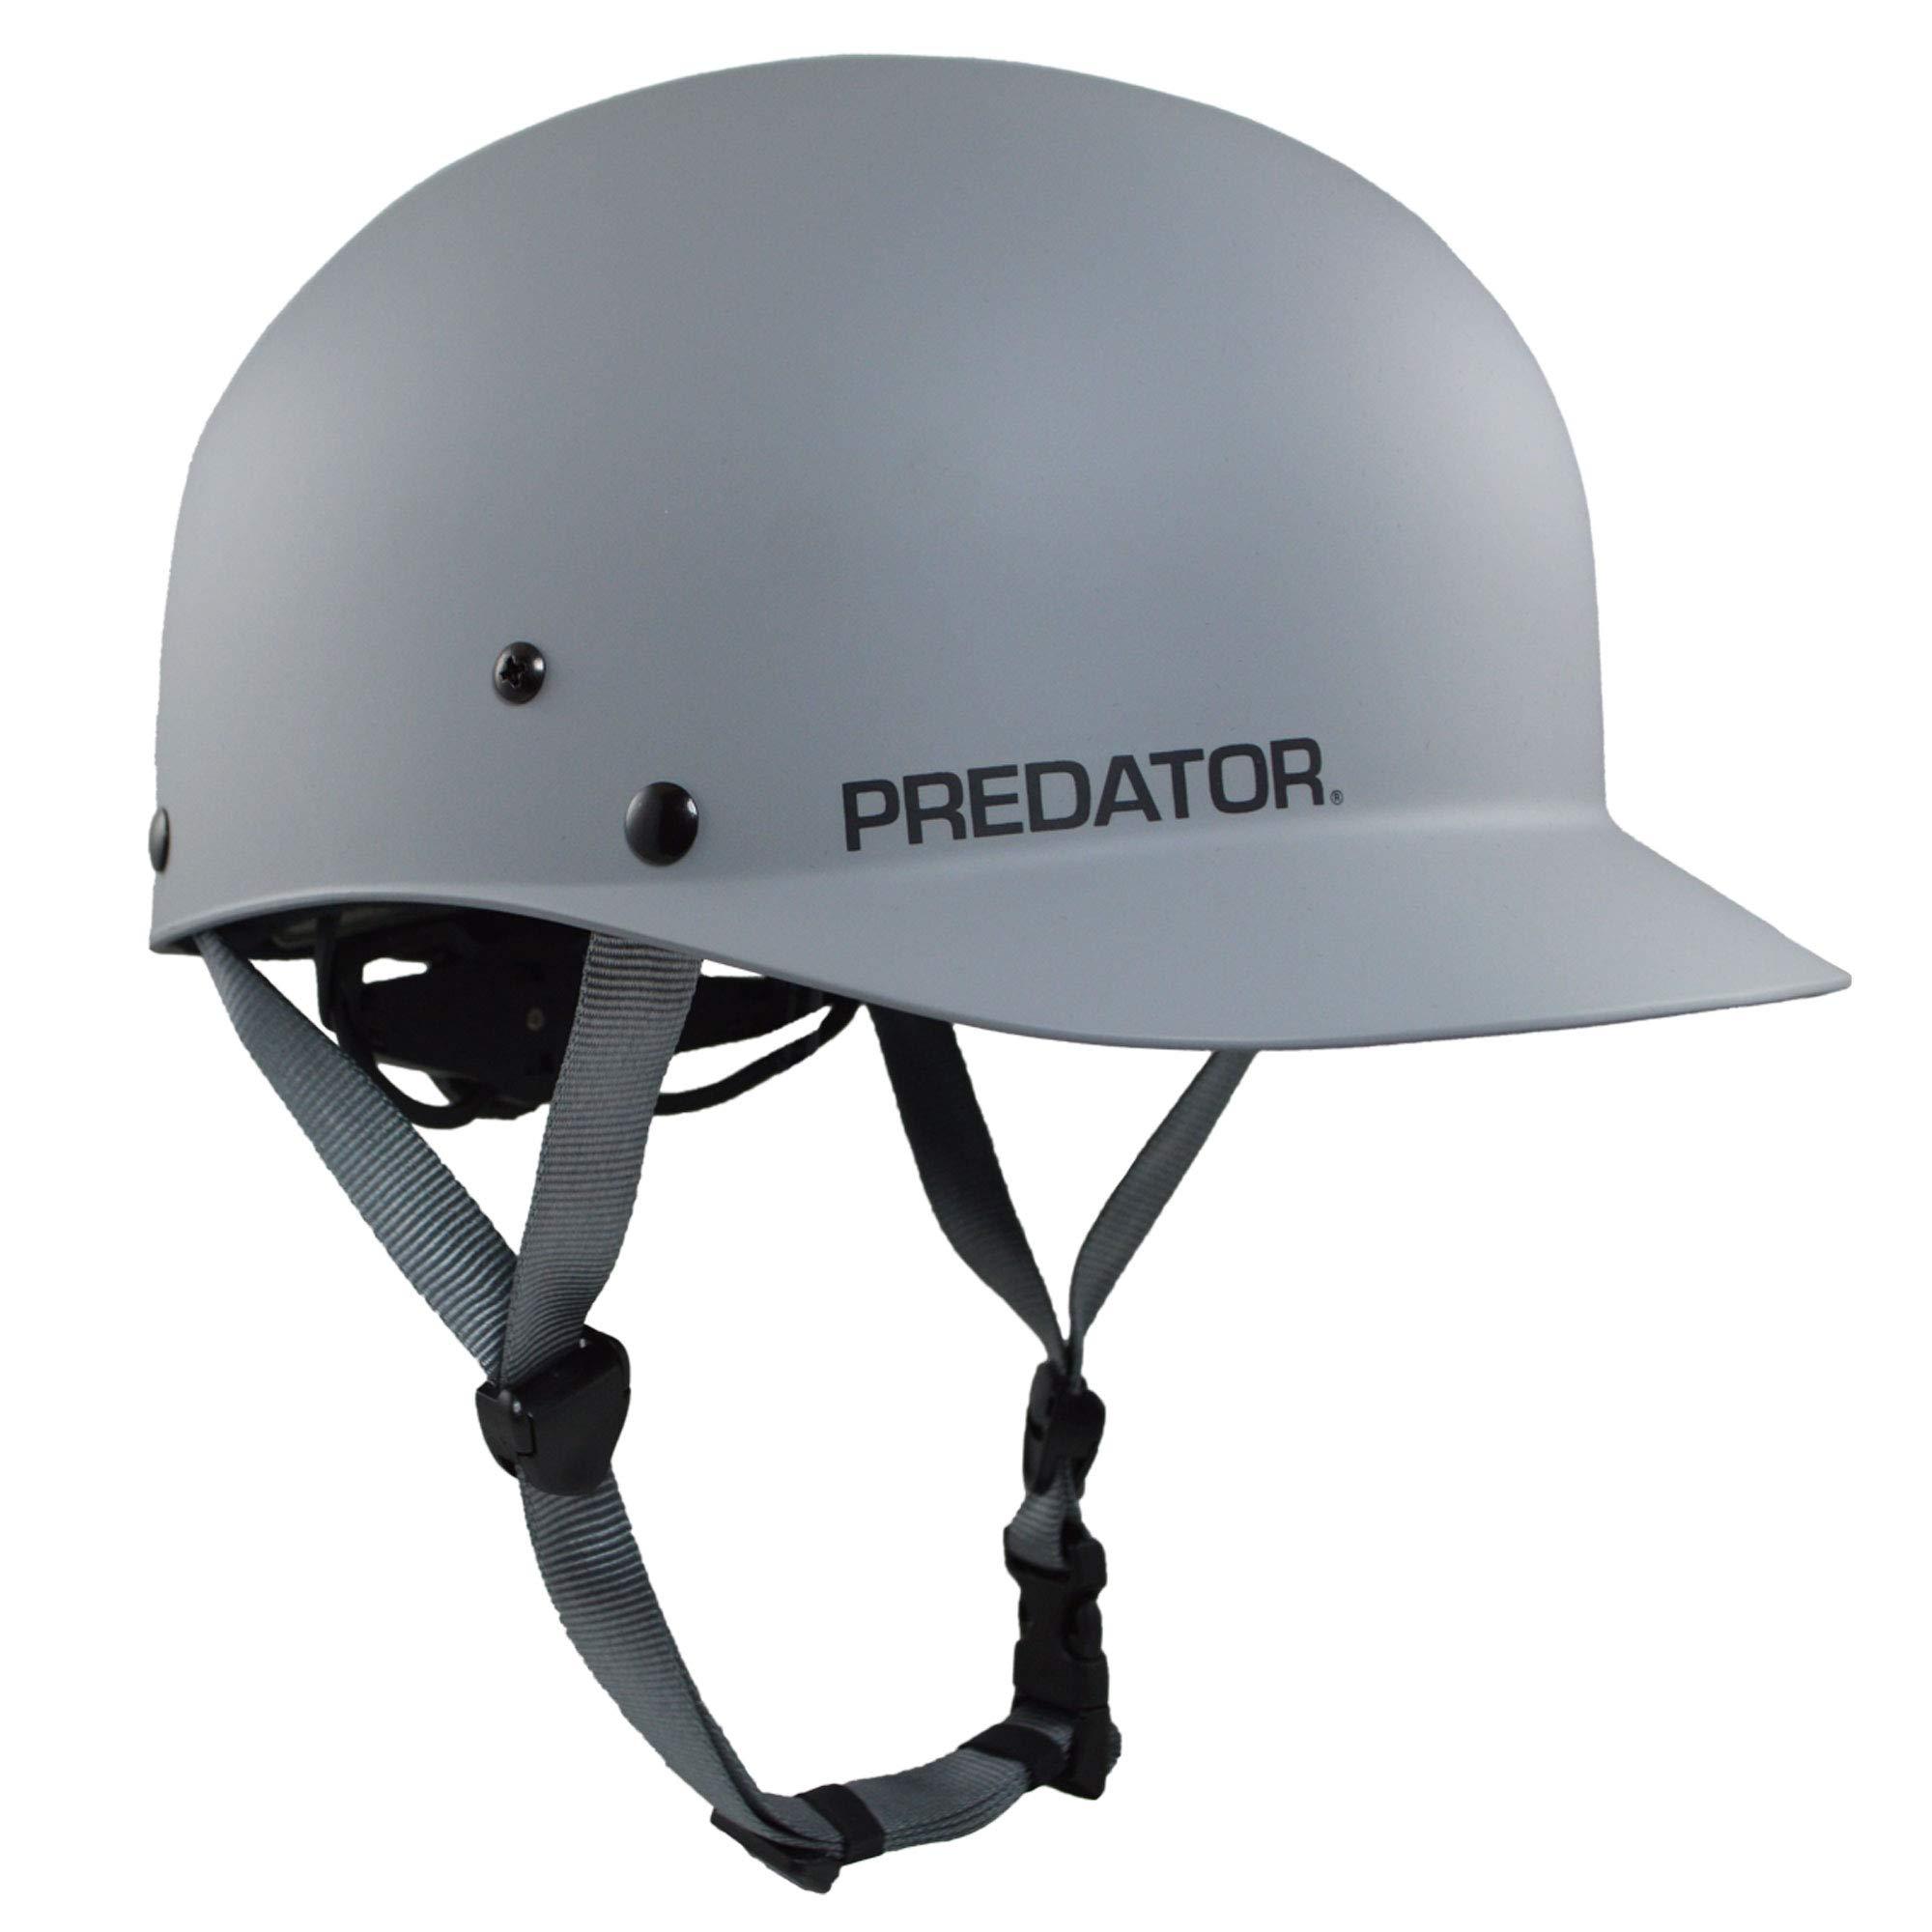 Predator Shiznit Kayak Helmet-MatteGrey-L/XL by Predator